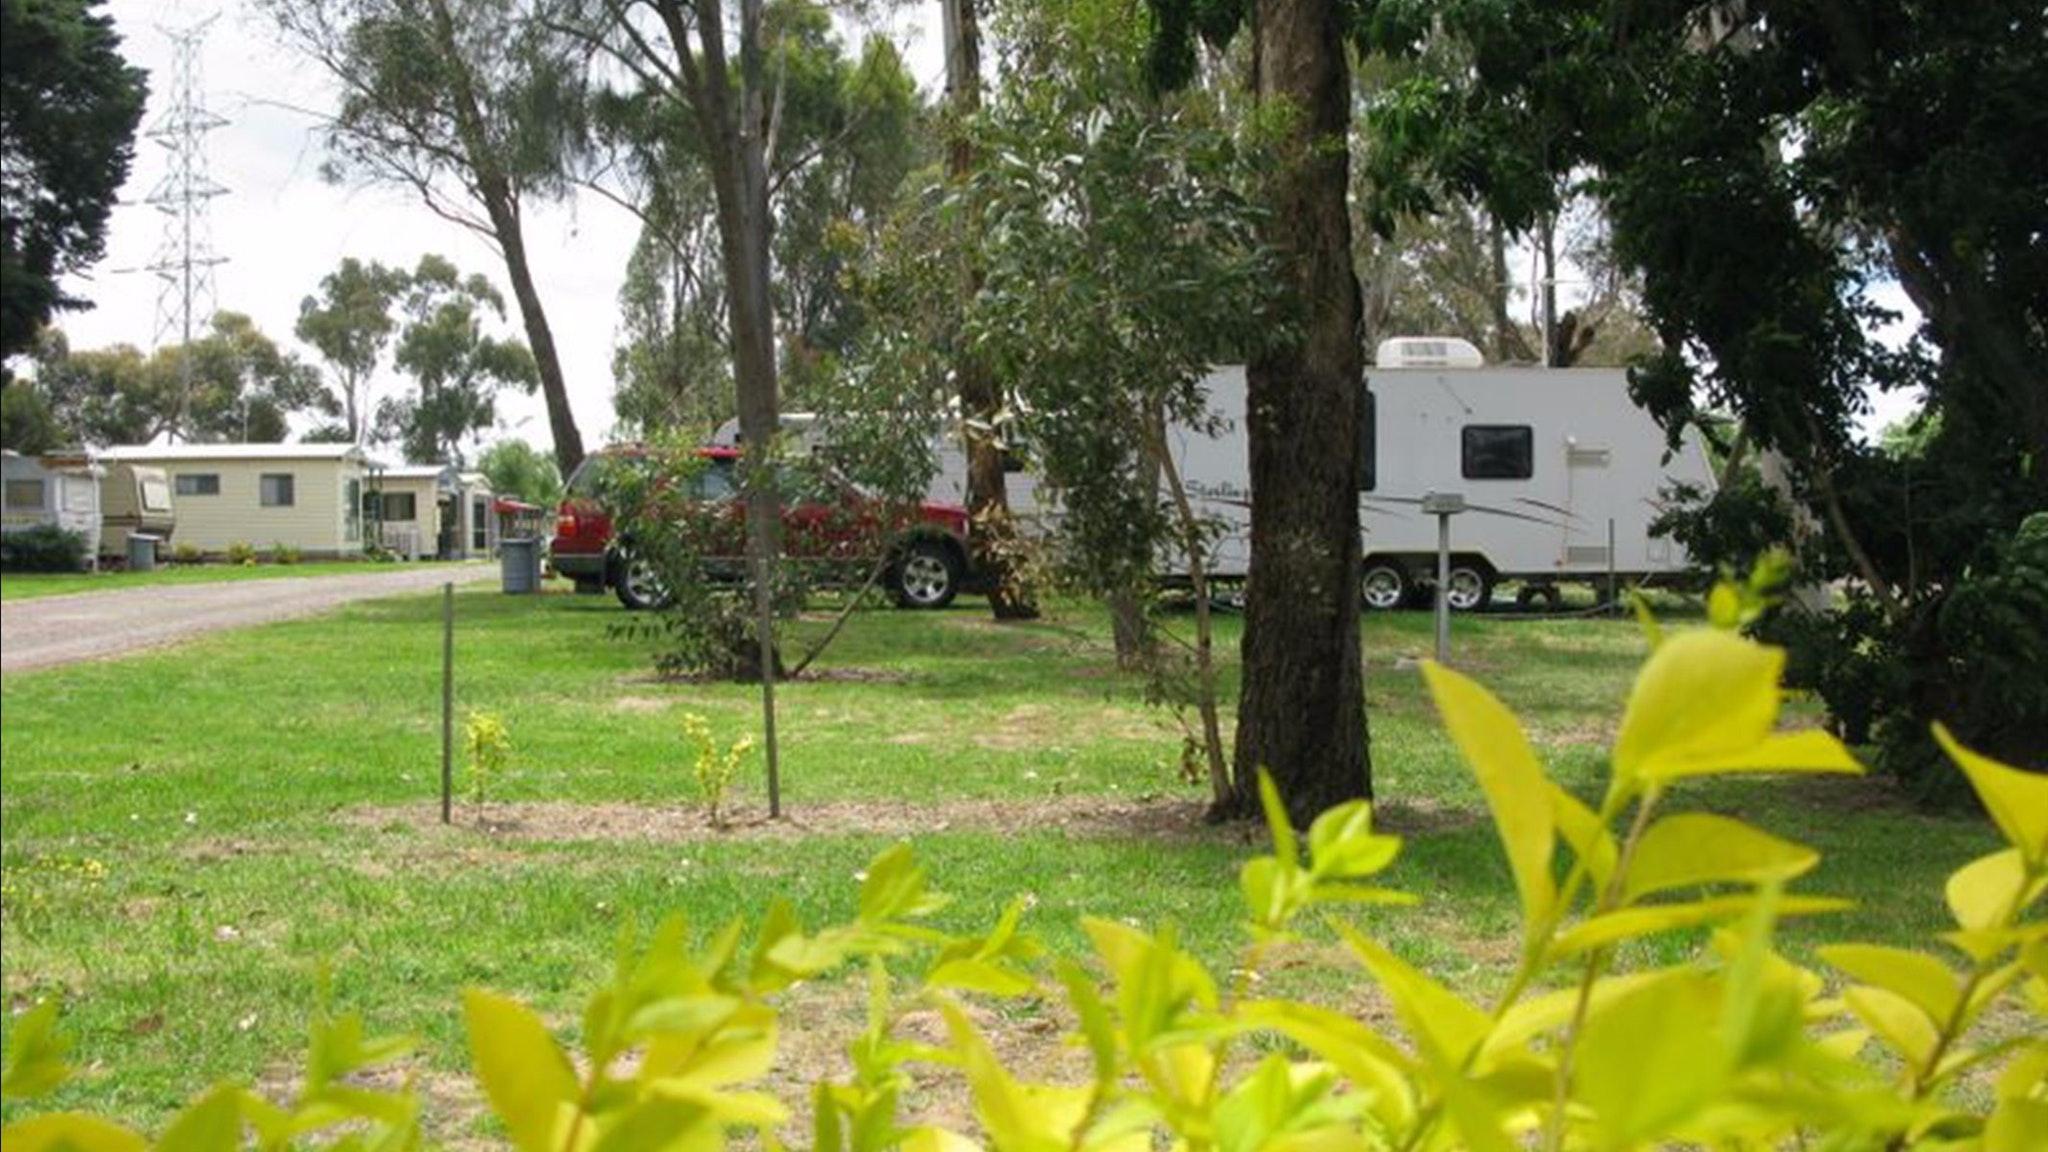 Moolap Caravan Park